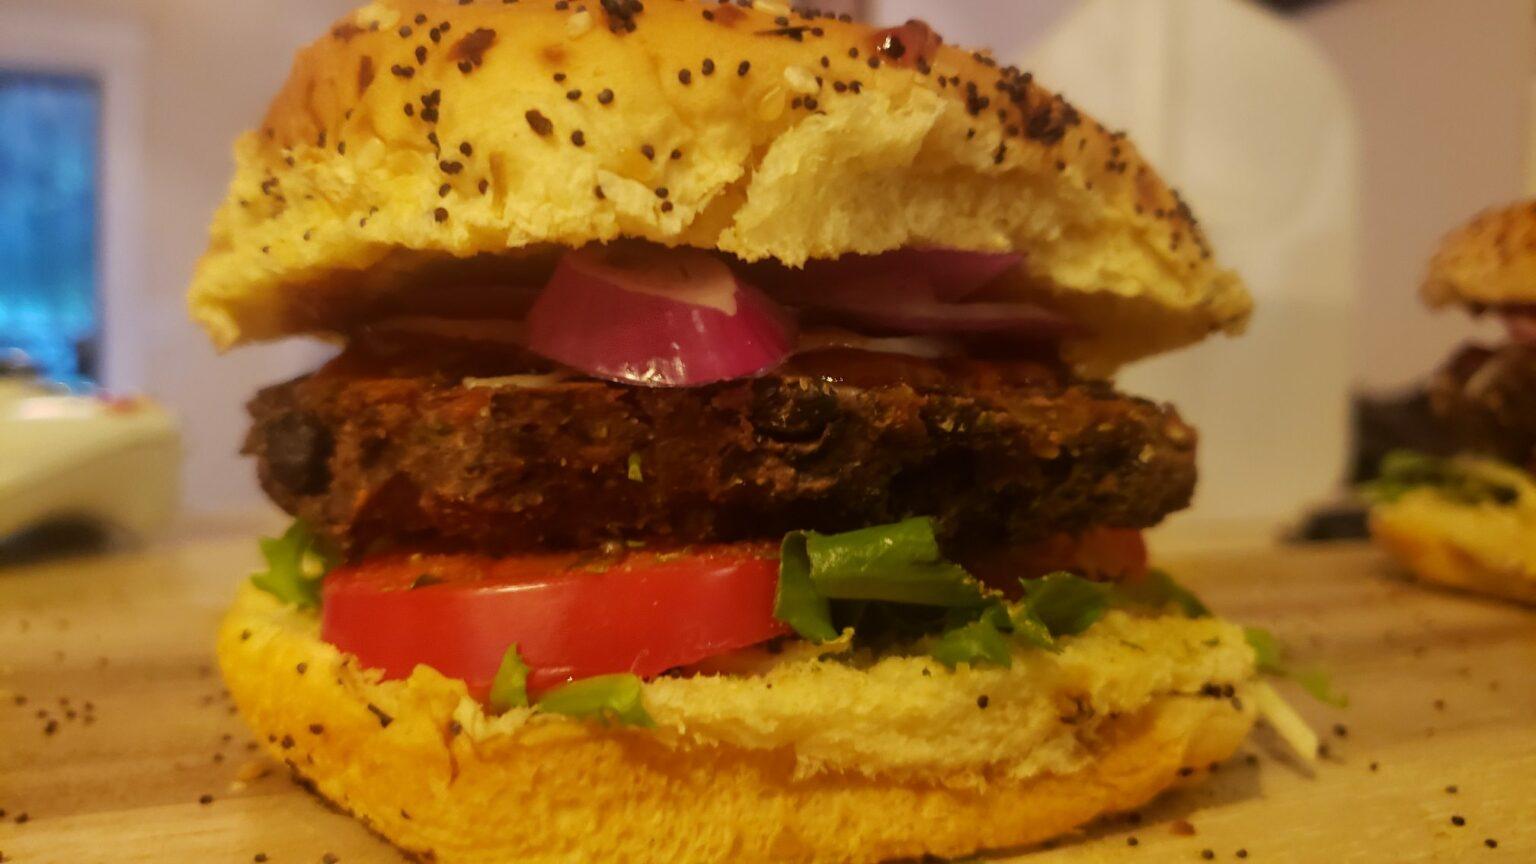 image of dressed homemade black bean burger